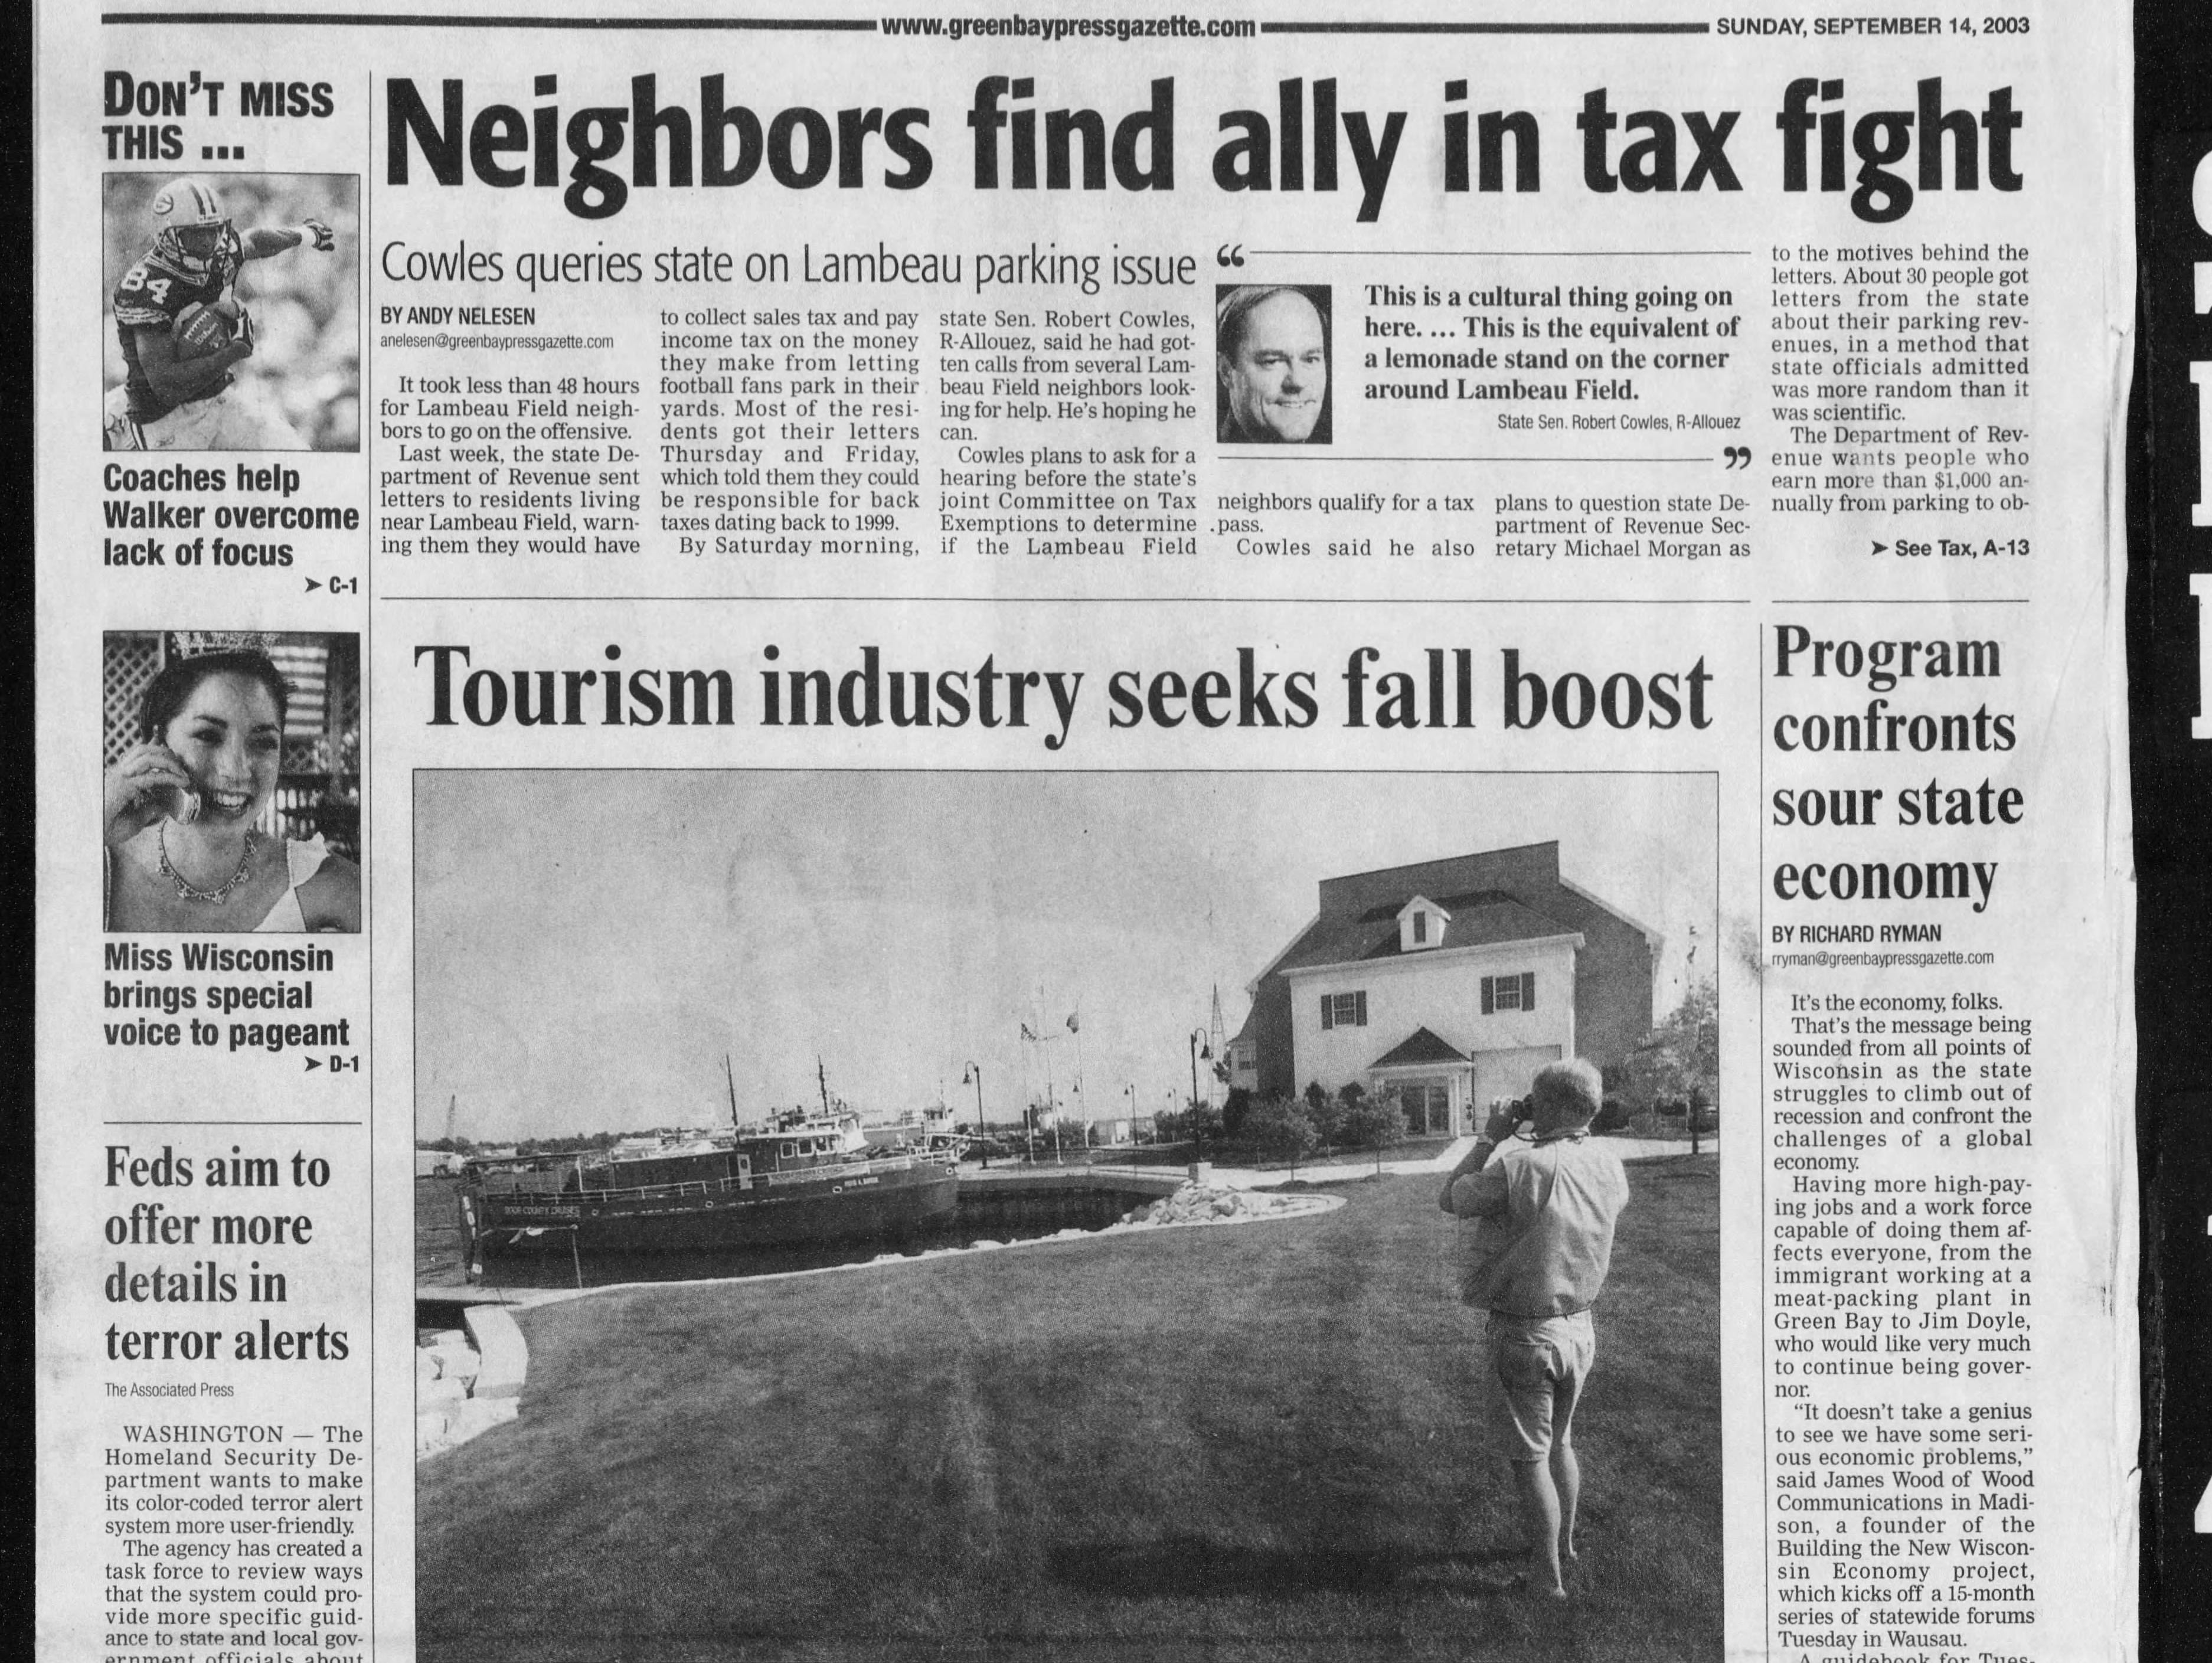 Sept. 14, 2003